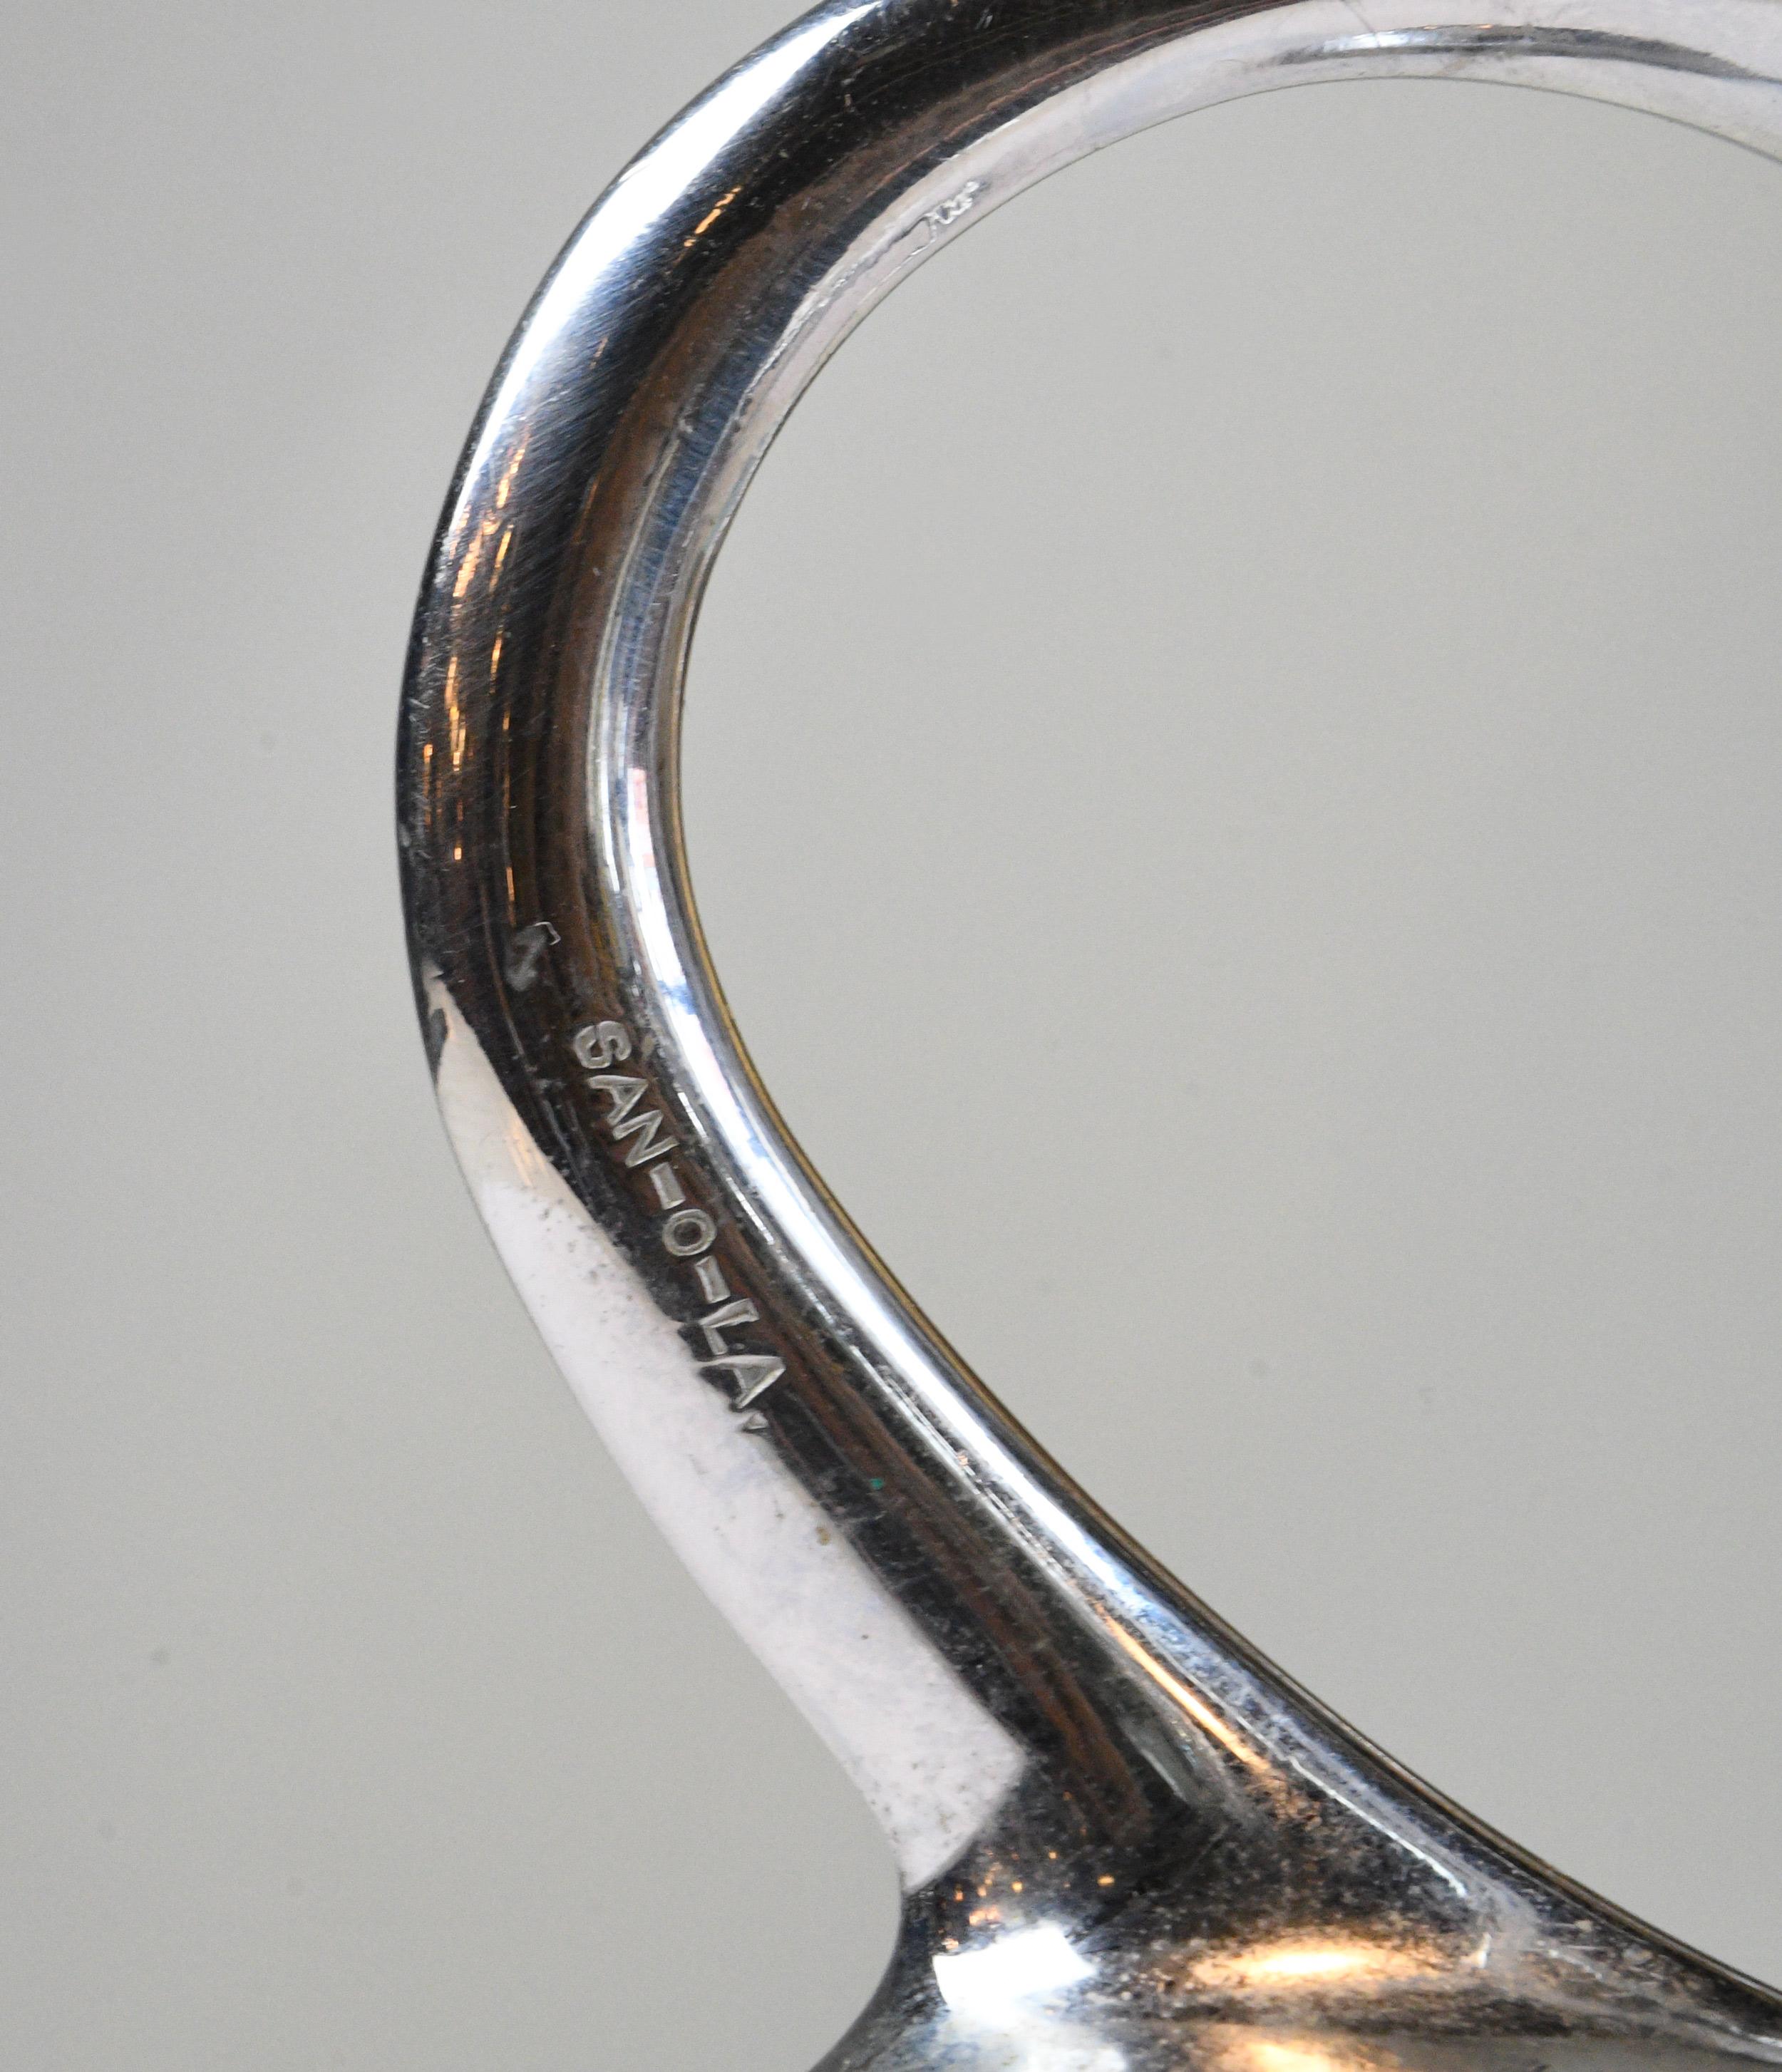 44793-nickel-plated-soap-holder-makers-mark.jpg